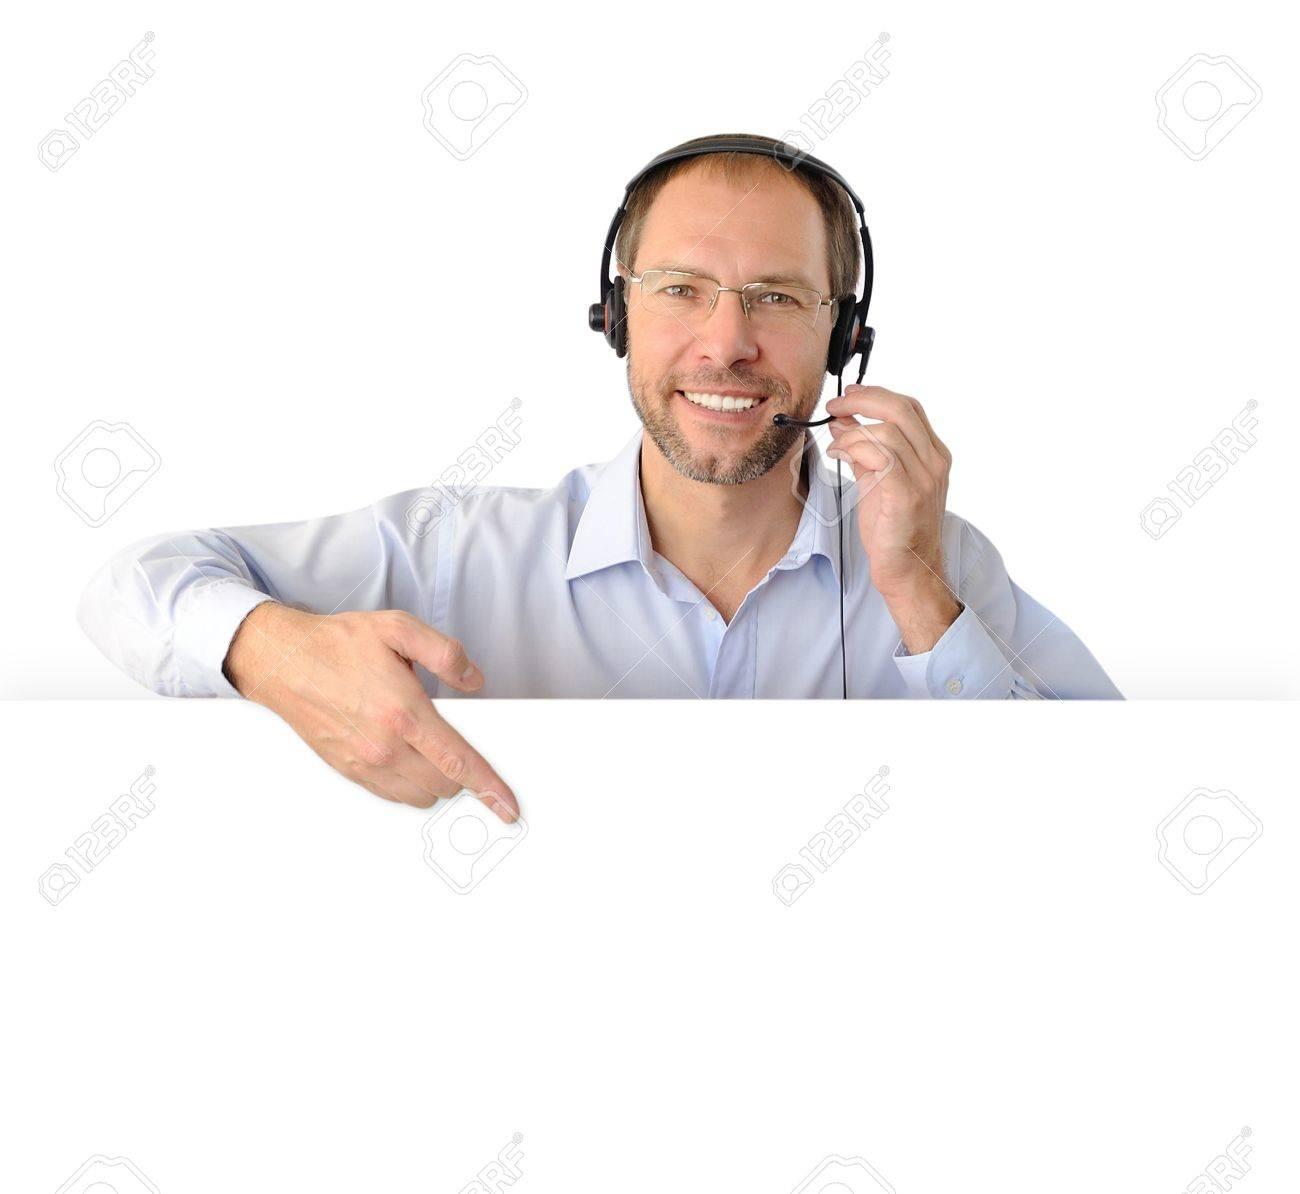 Portrait of phone operator isolated on white background - 16234562